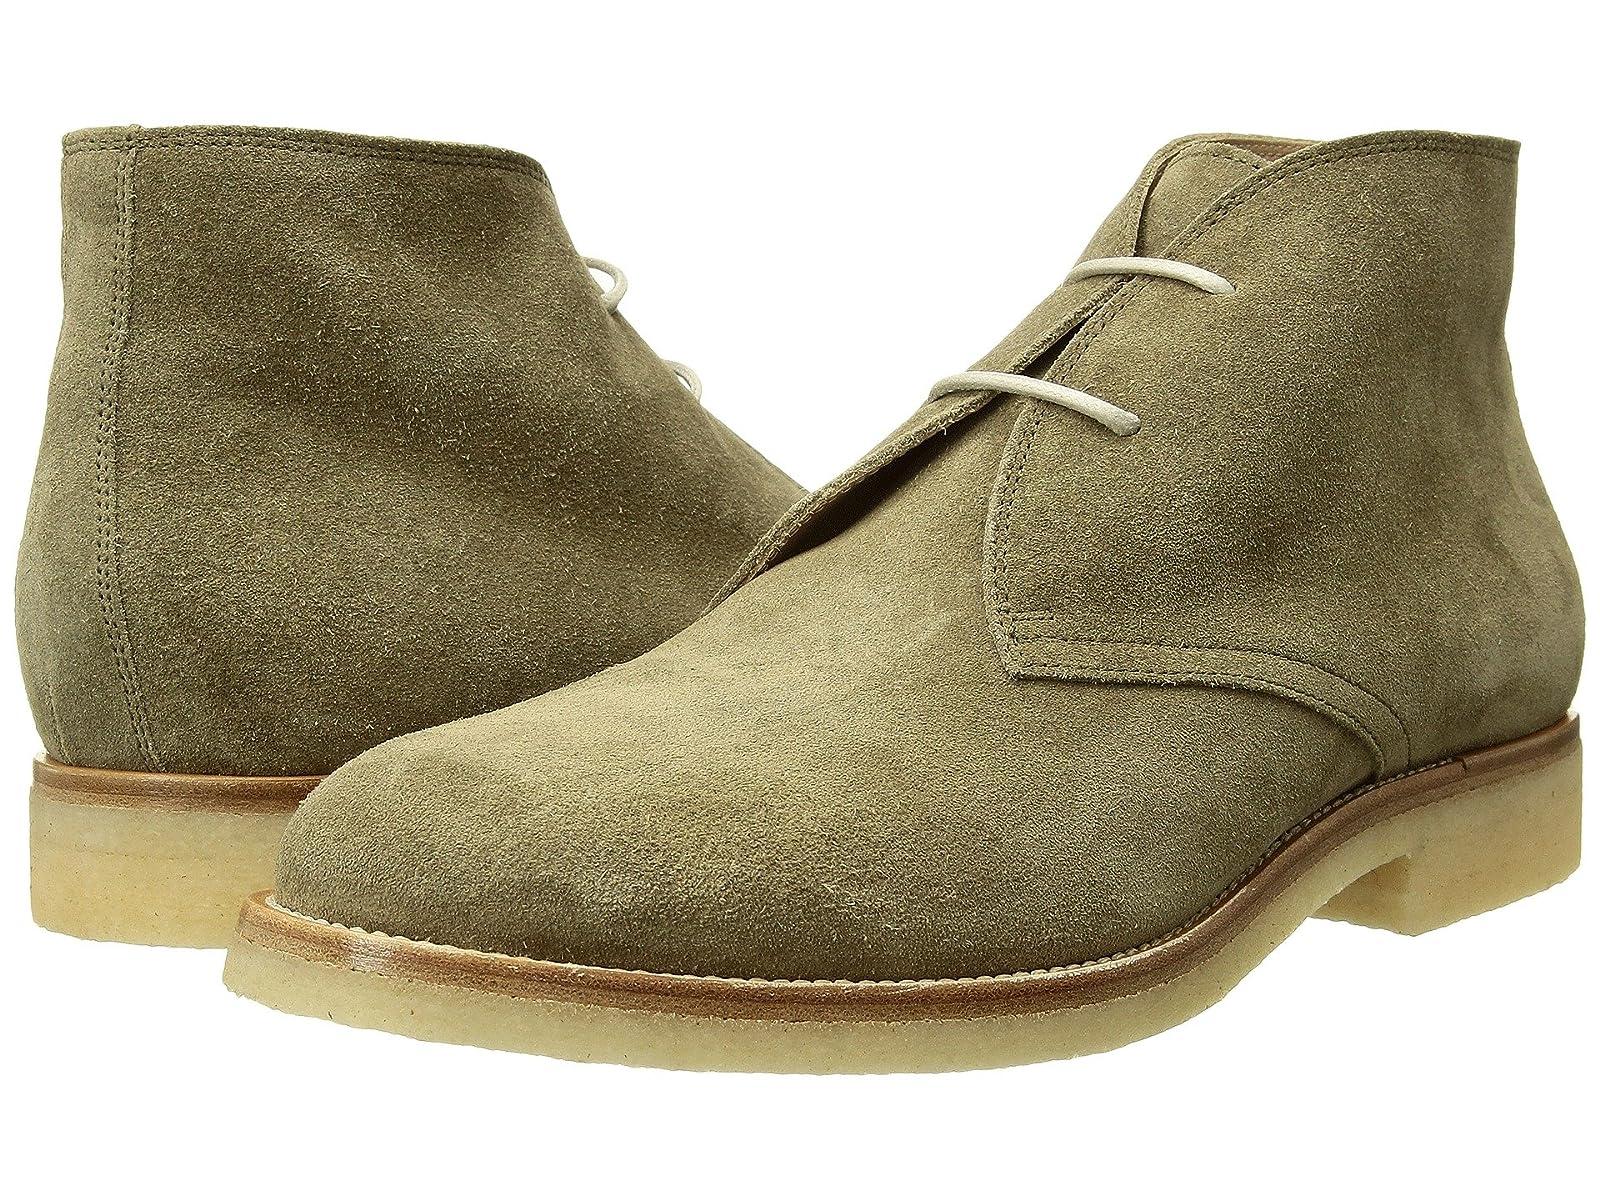 BELSTAFF Harlsedon BootSelling fashionable and eye-catching shoes